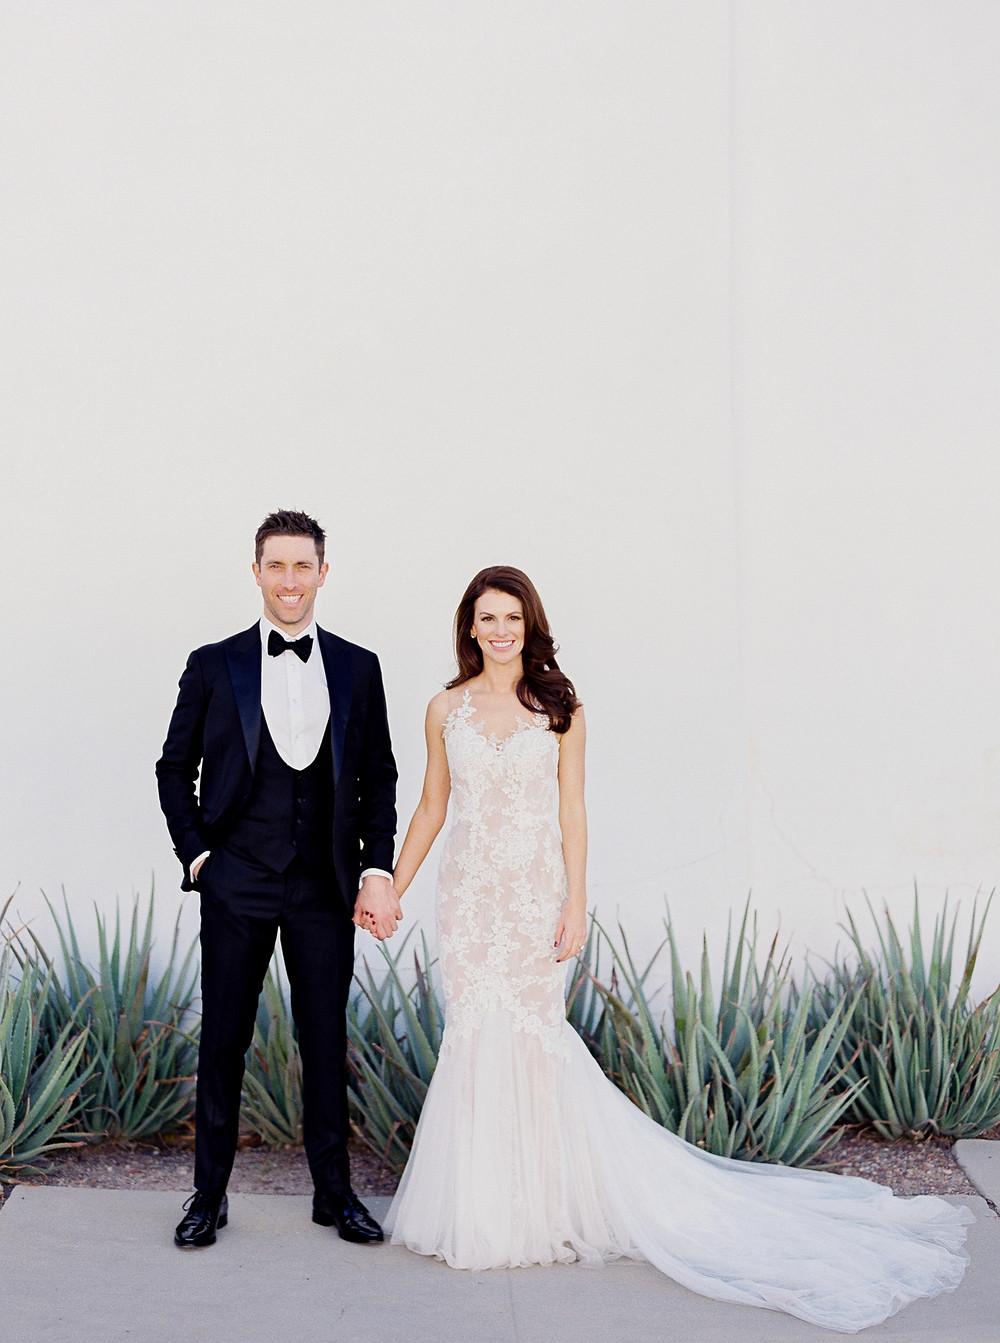 Tucson, Arizona Wedding, Couple Portrait